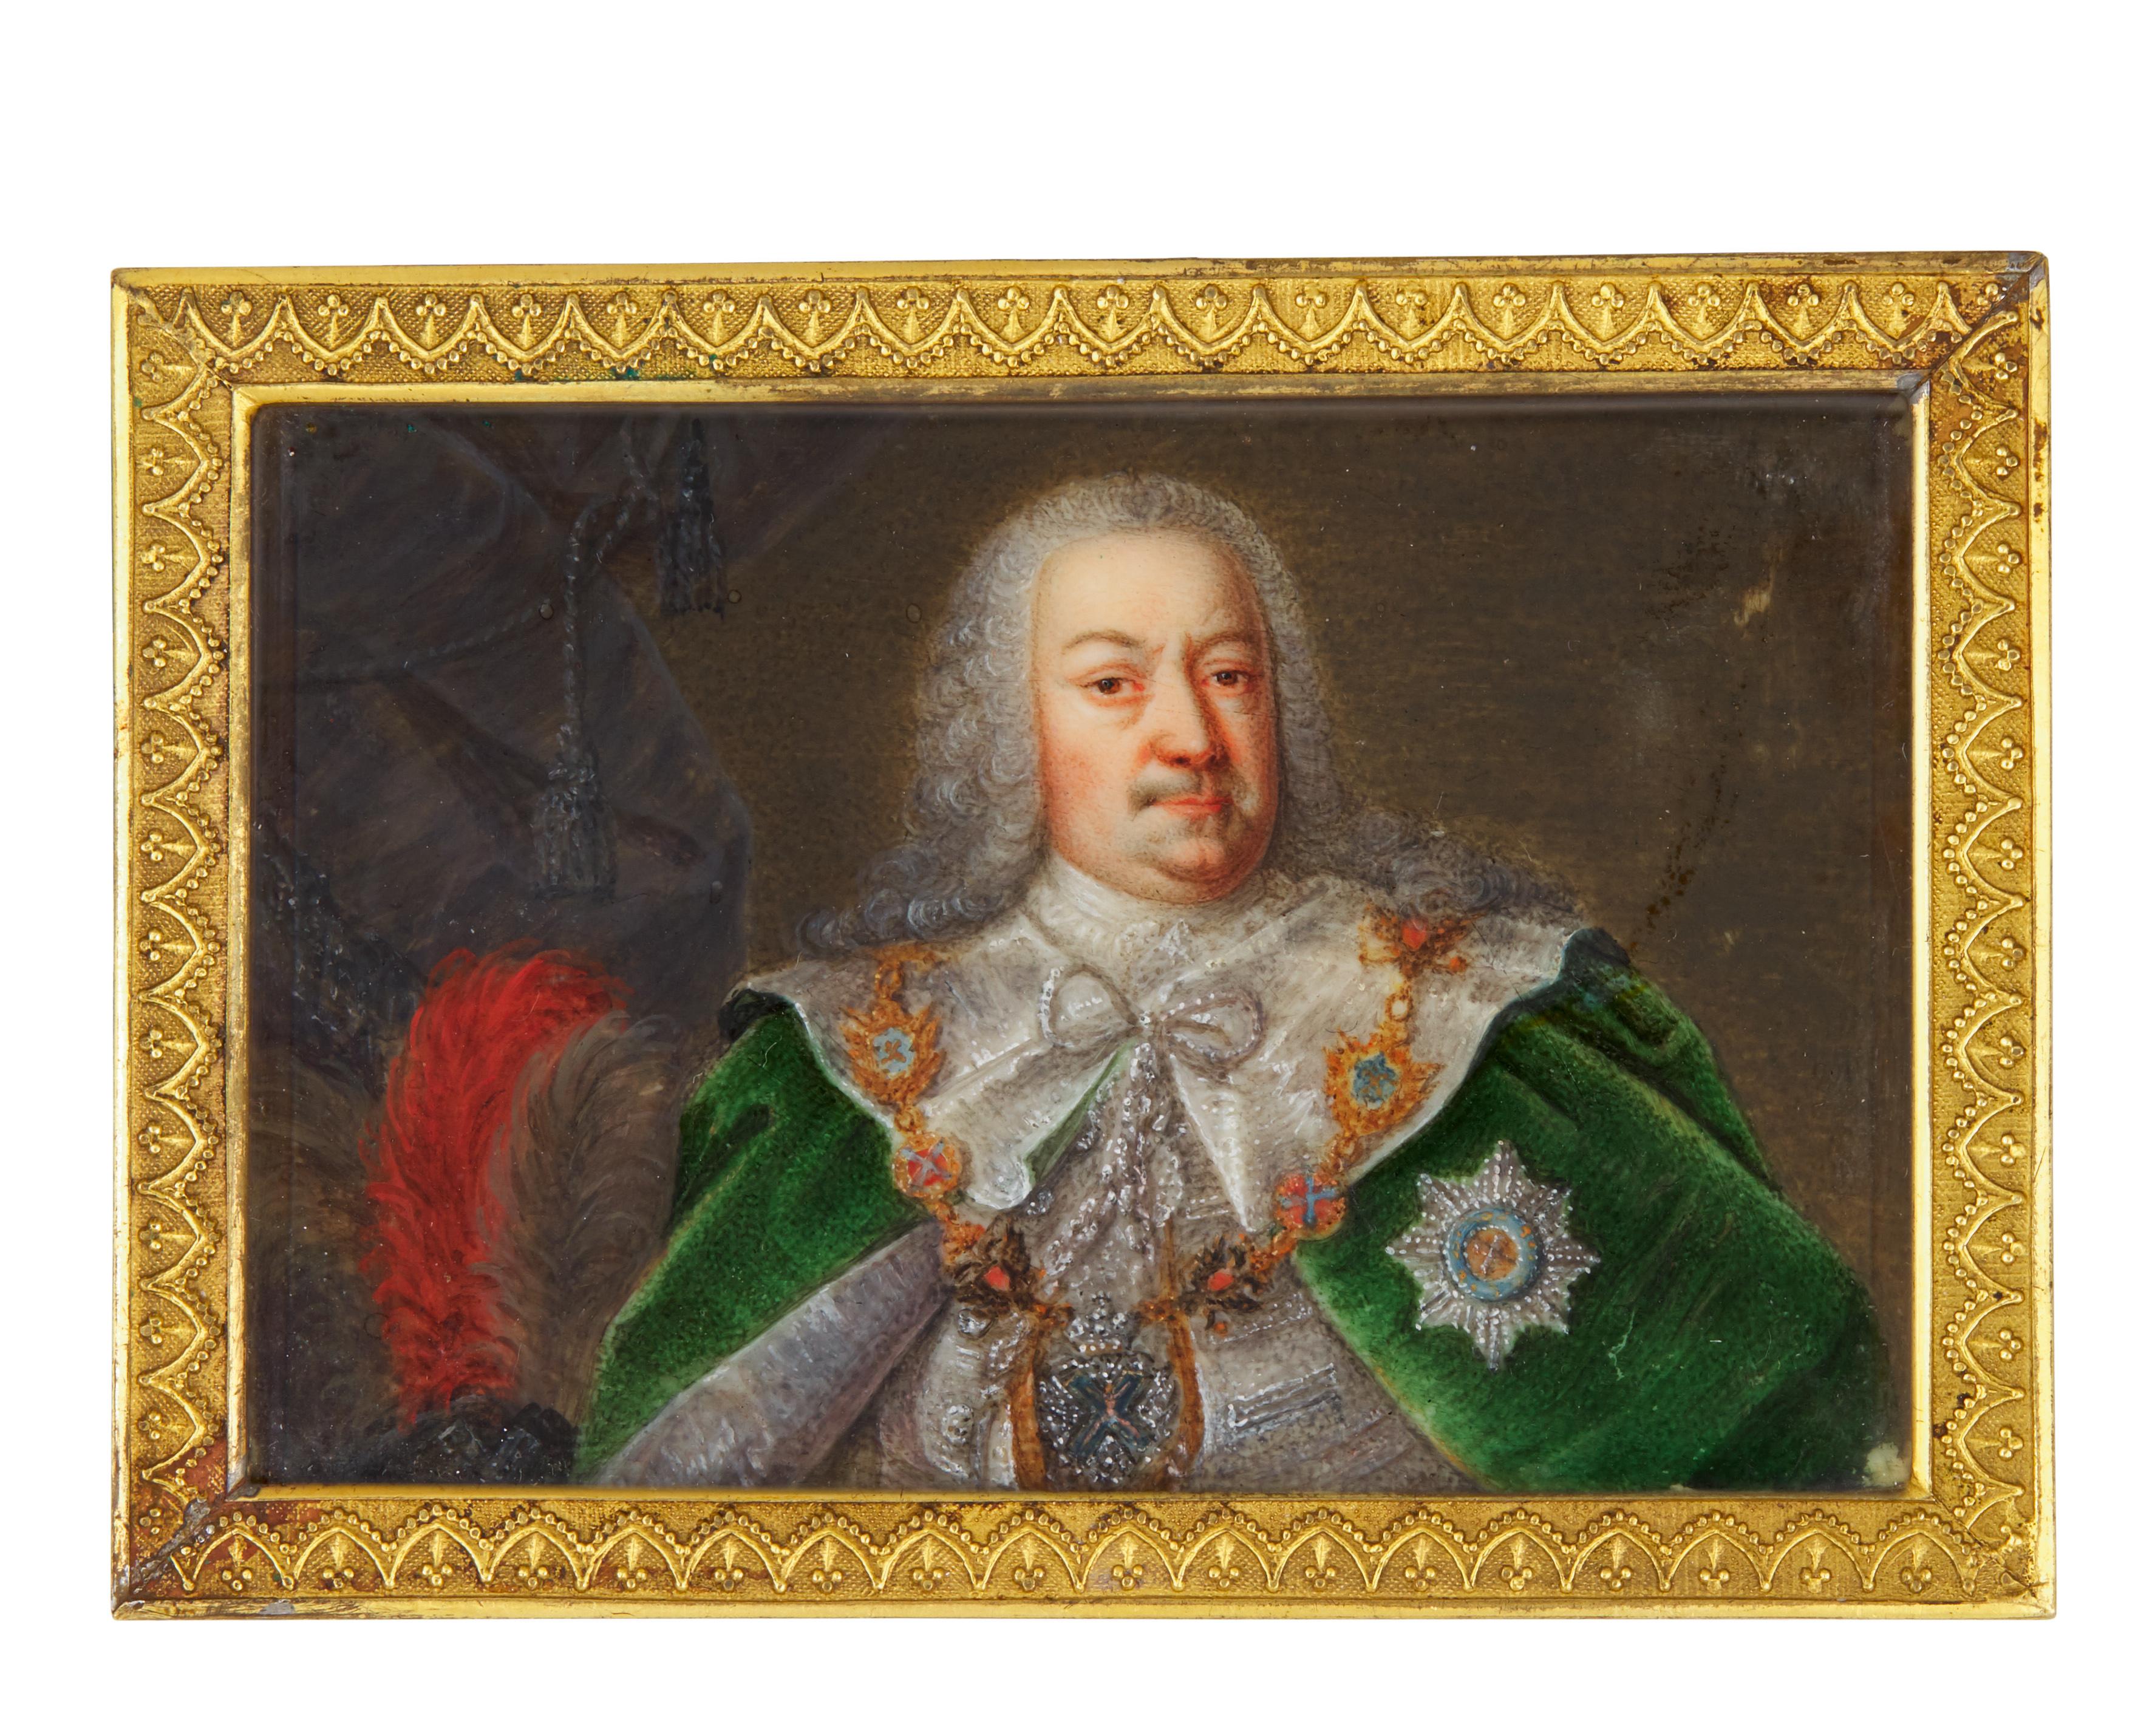 View 1 of Lot 228. A portrait miniature of Count Hermann Carl Graf von Keyserling, probably German, circa 1750-1760.